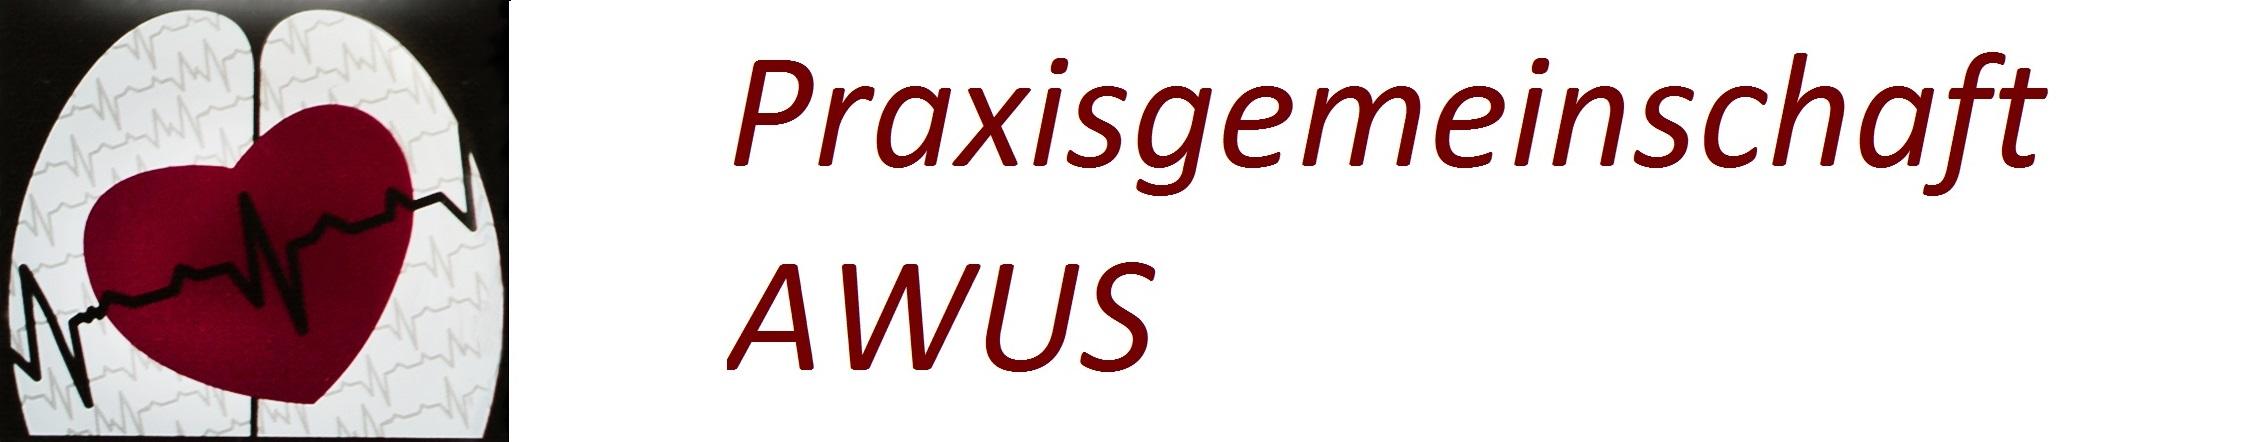 Praxis AWUS Sigmaringen